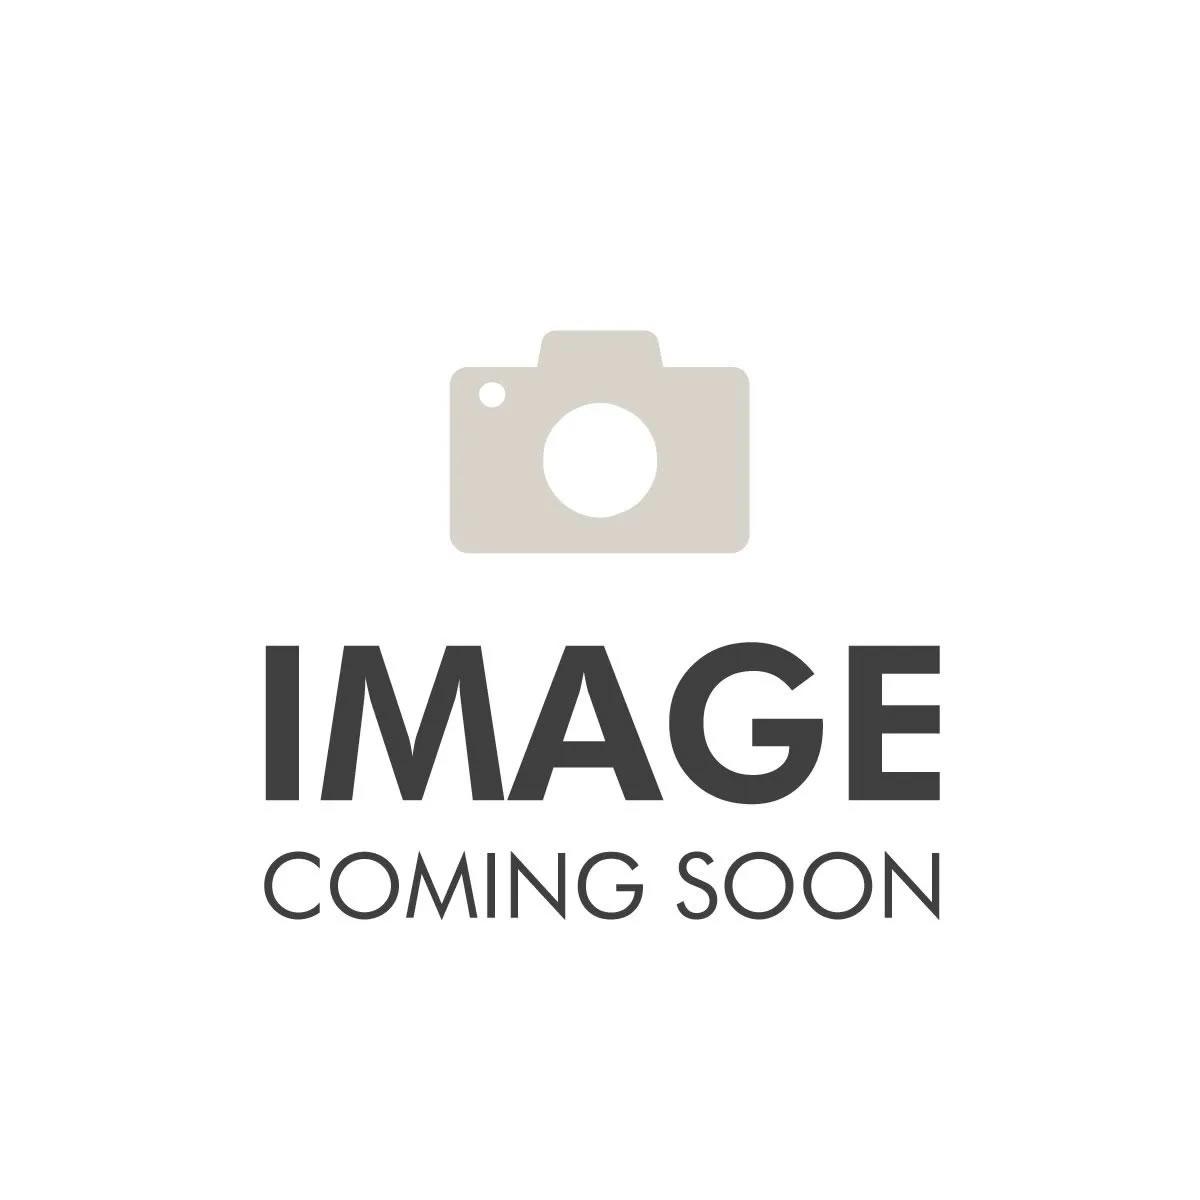 Fabric Rear Seat Covers, Black; 03-06 Jeep Wrangler TJ